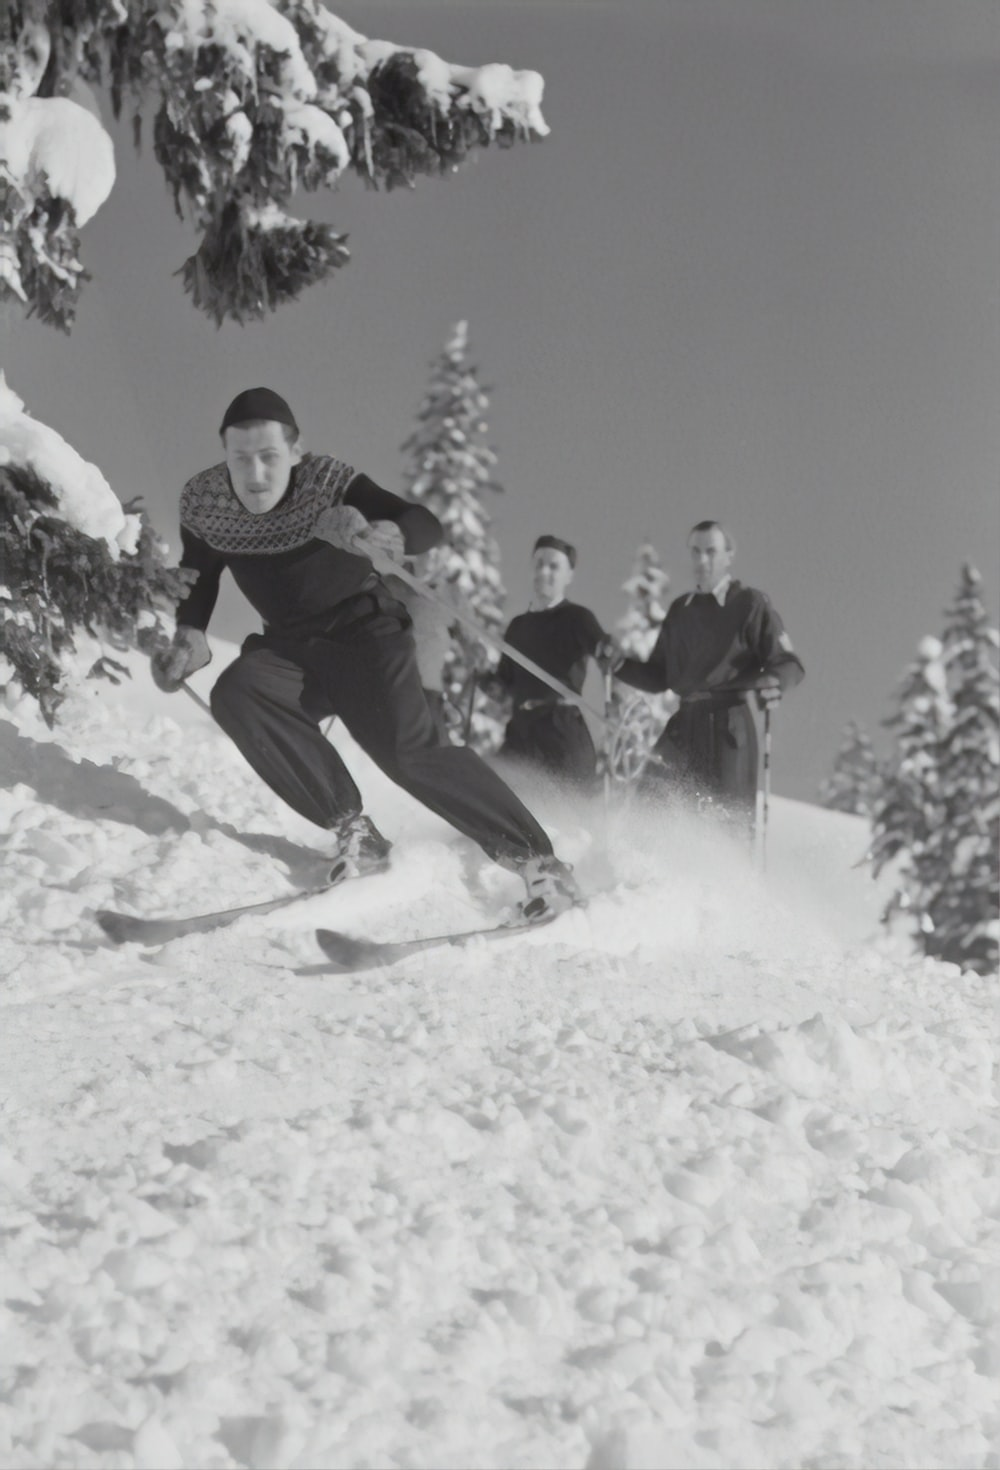 grayscale photography of people doing nordic skiing